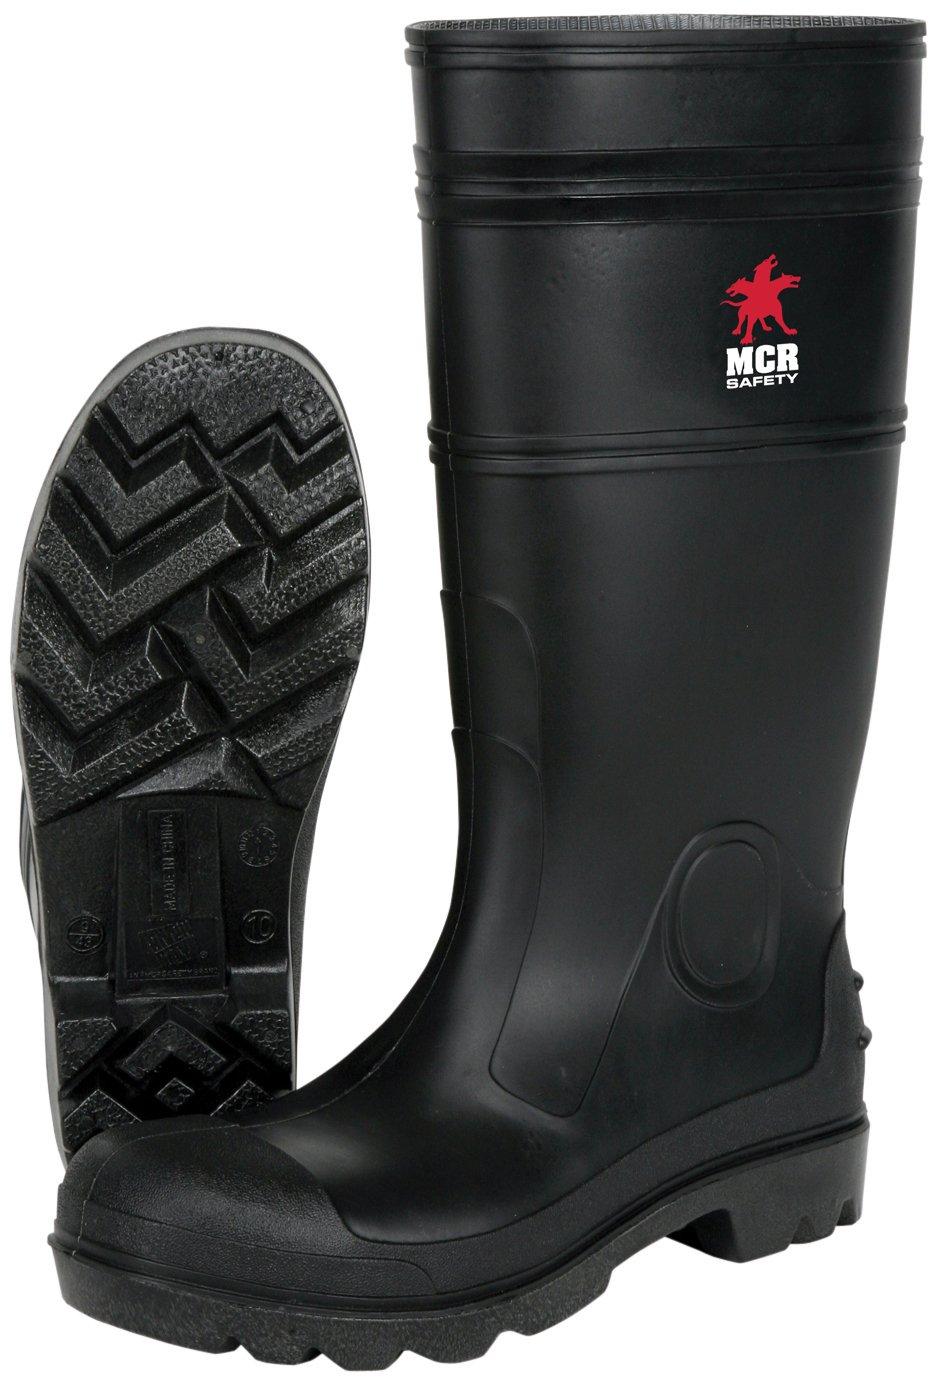 MCR Safety PBS12011 Waterproof PVC Men's Knee Boot with Steel Toe, Black, Size 11, 1-Pair